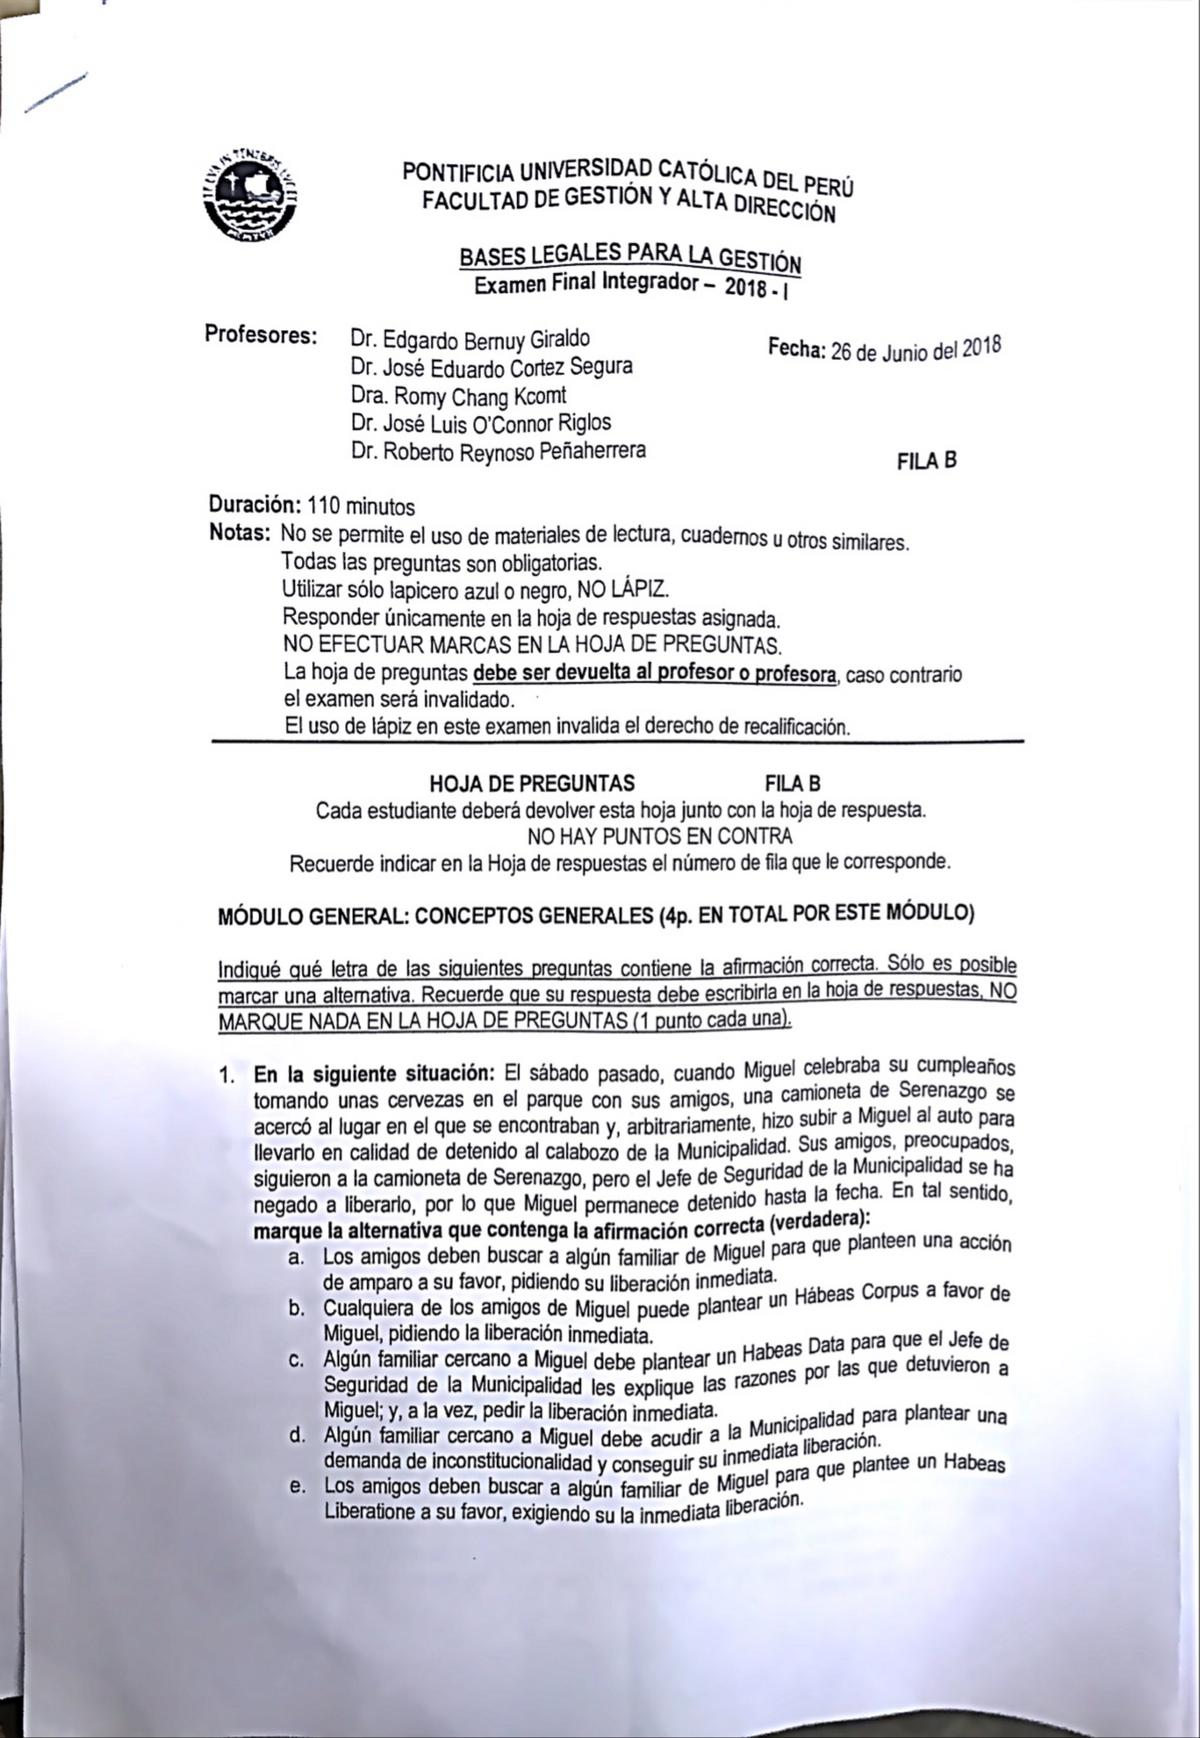 Escaneo 3 Dic 2018 18 22 Bases Legales Pucp Studocu